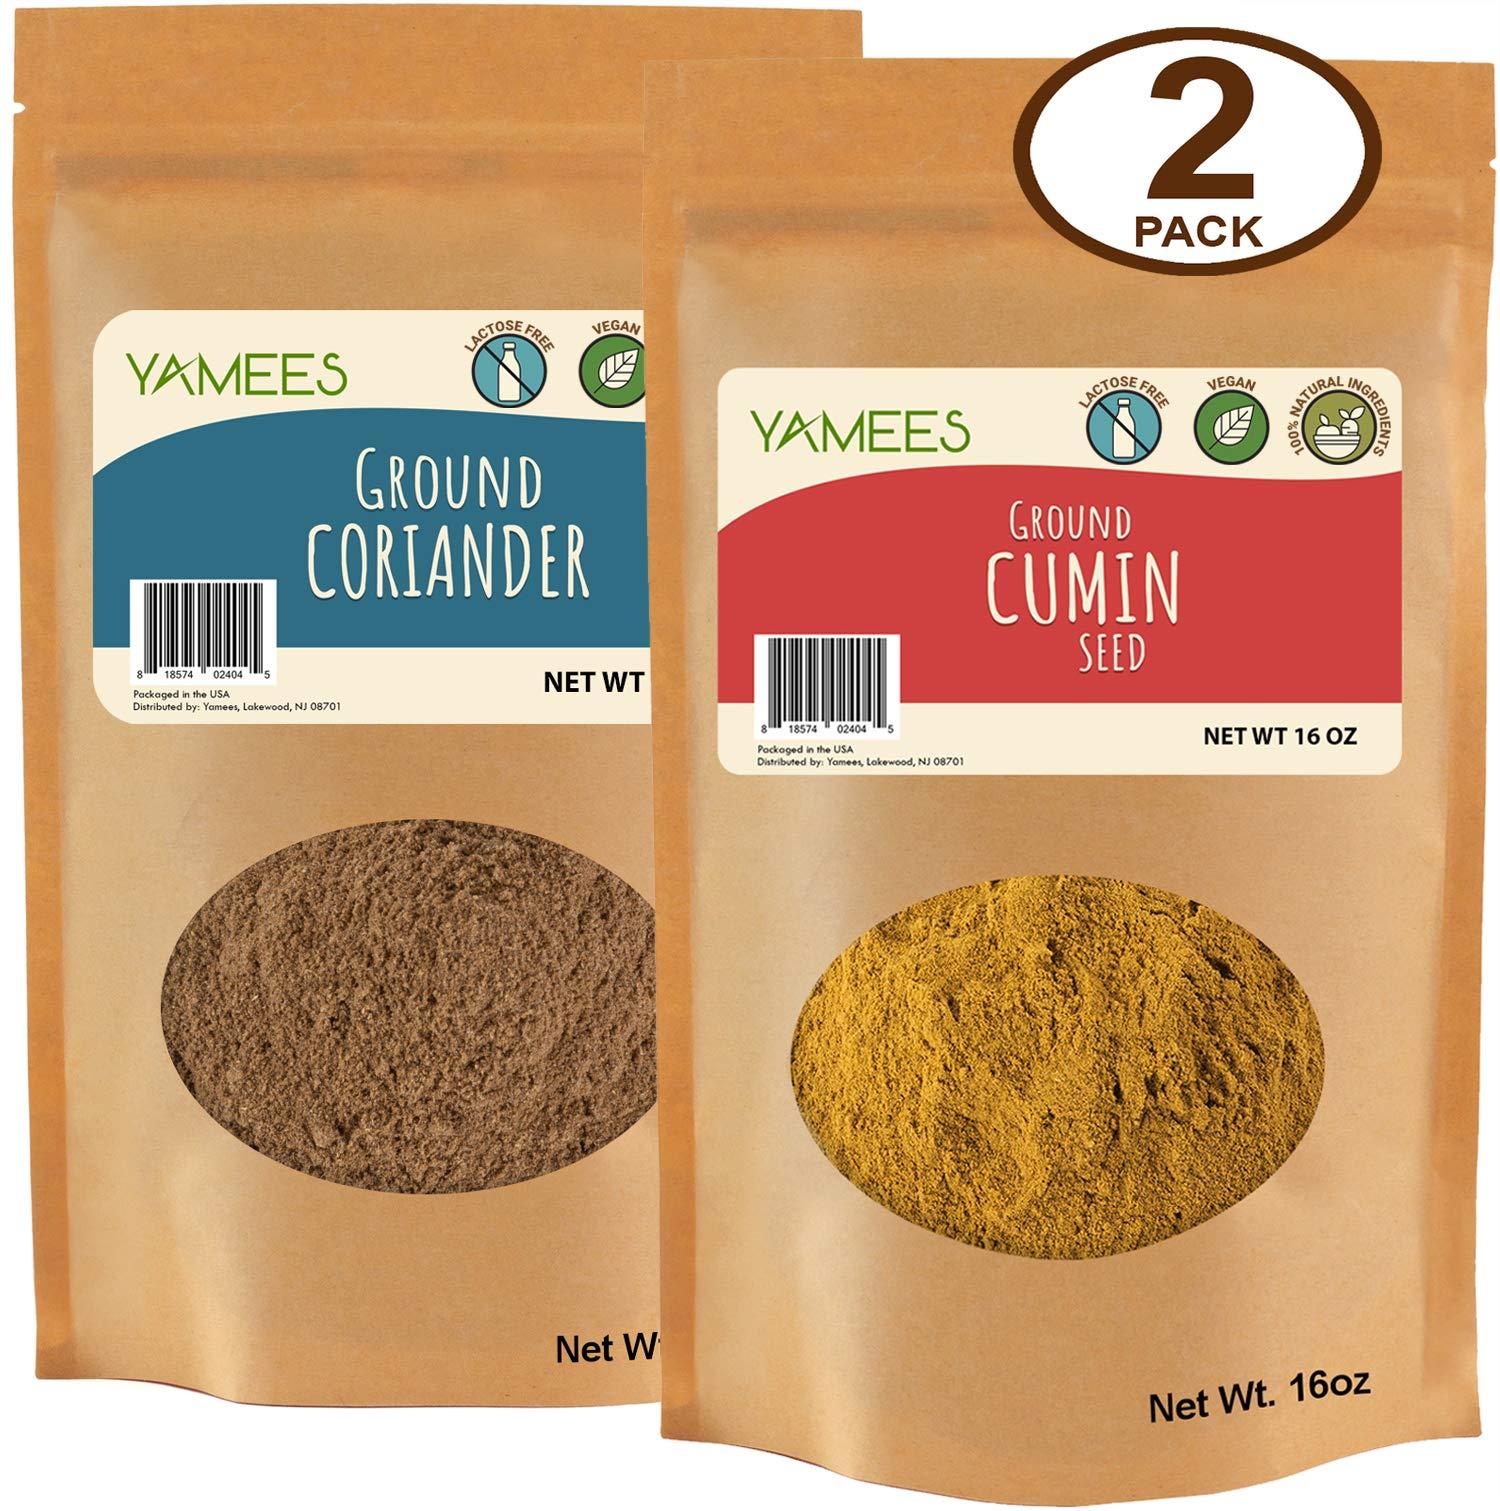 Cumin Powder - Coriander Powder - Coriander and Cumin Ground - Bulk Spices - 2 Pack of 14 Ounce Each